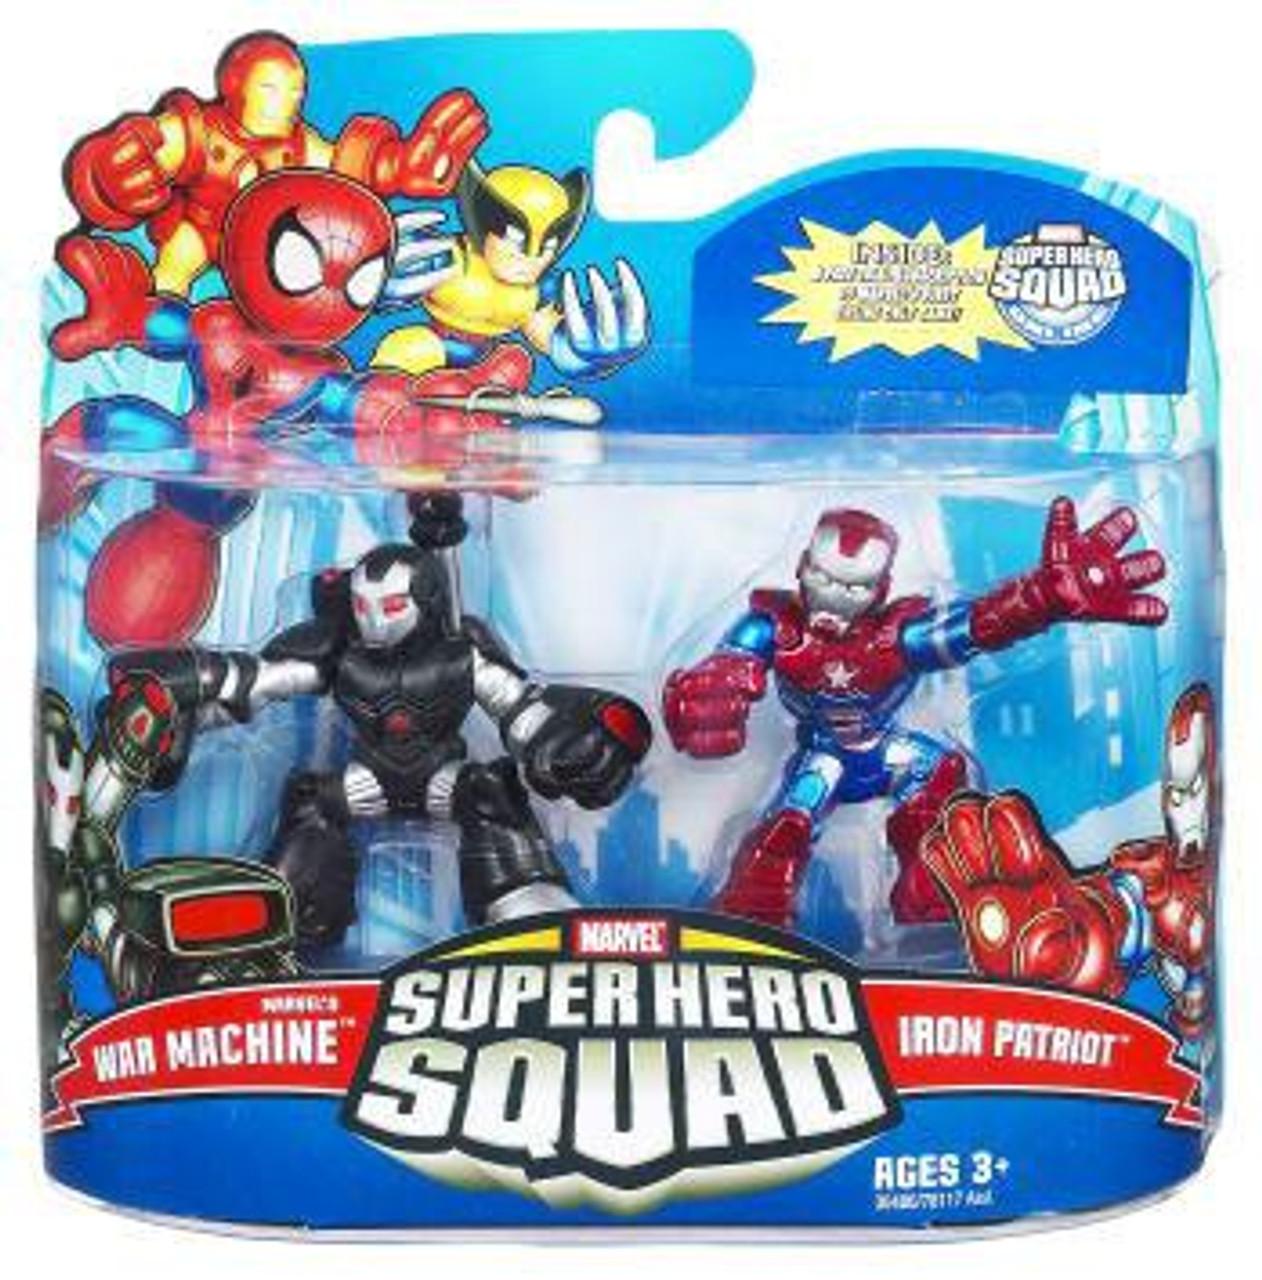 Super Hero Squad Series 21 Marvel's War Machine & Iron Patriot Action Figure 2-Pack